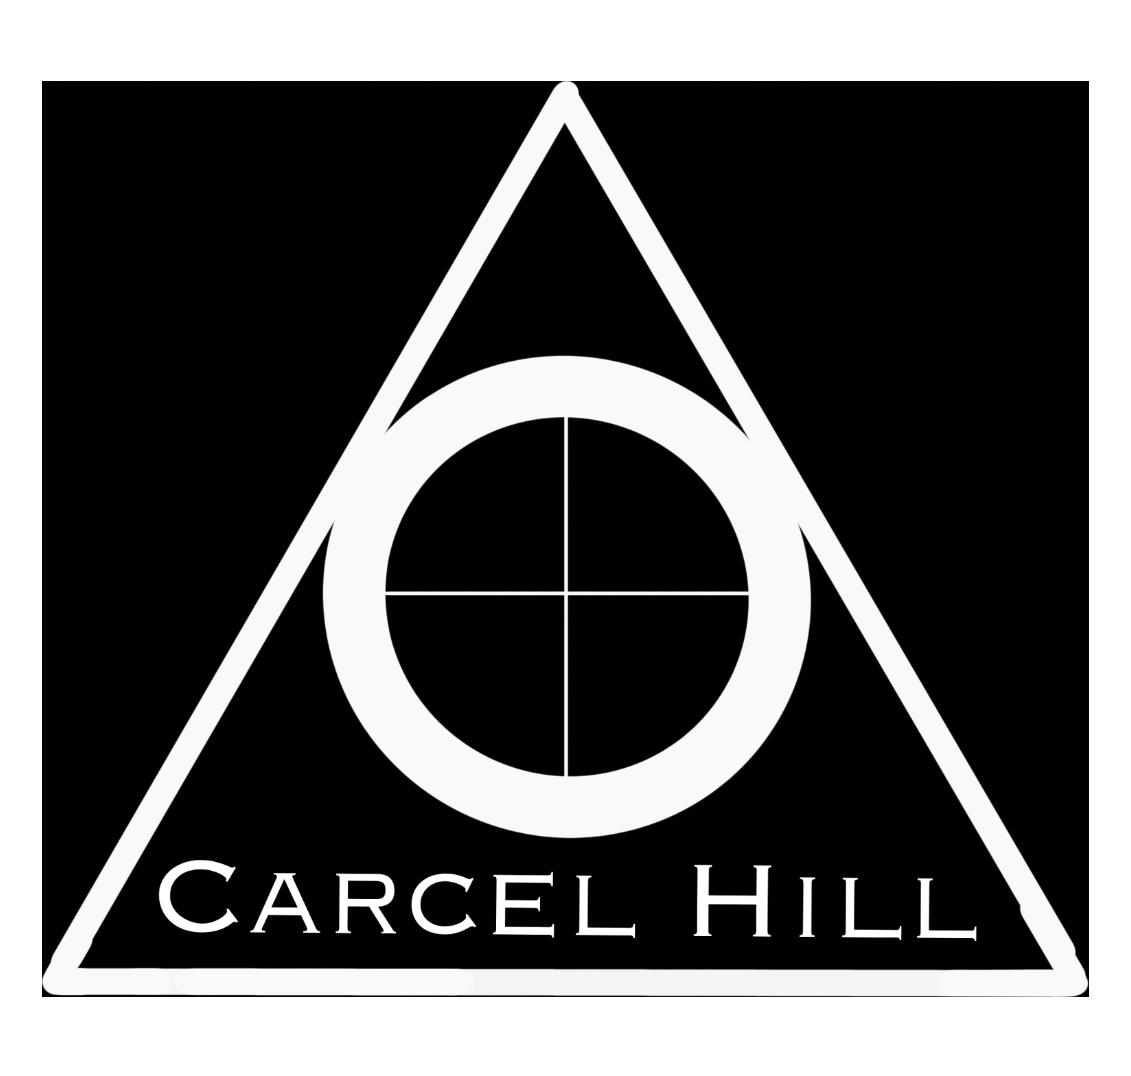 Carcel Hill